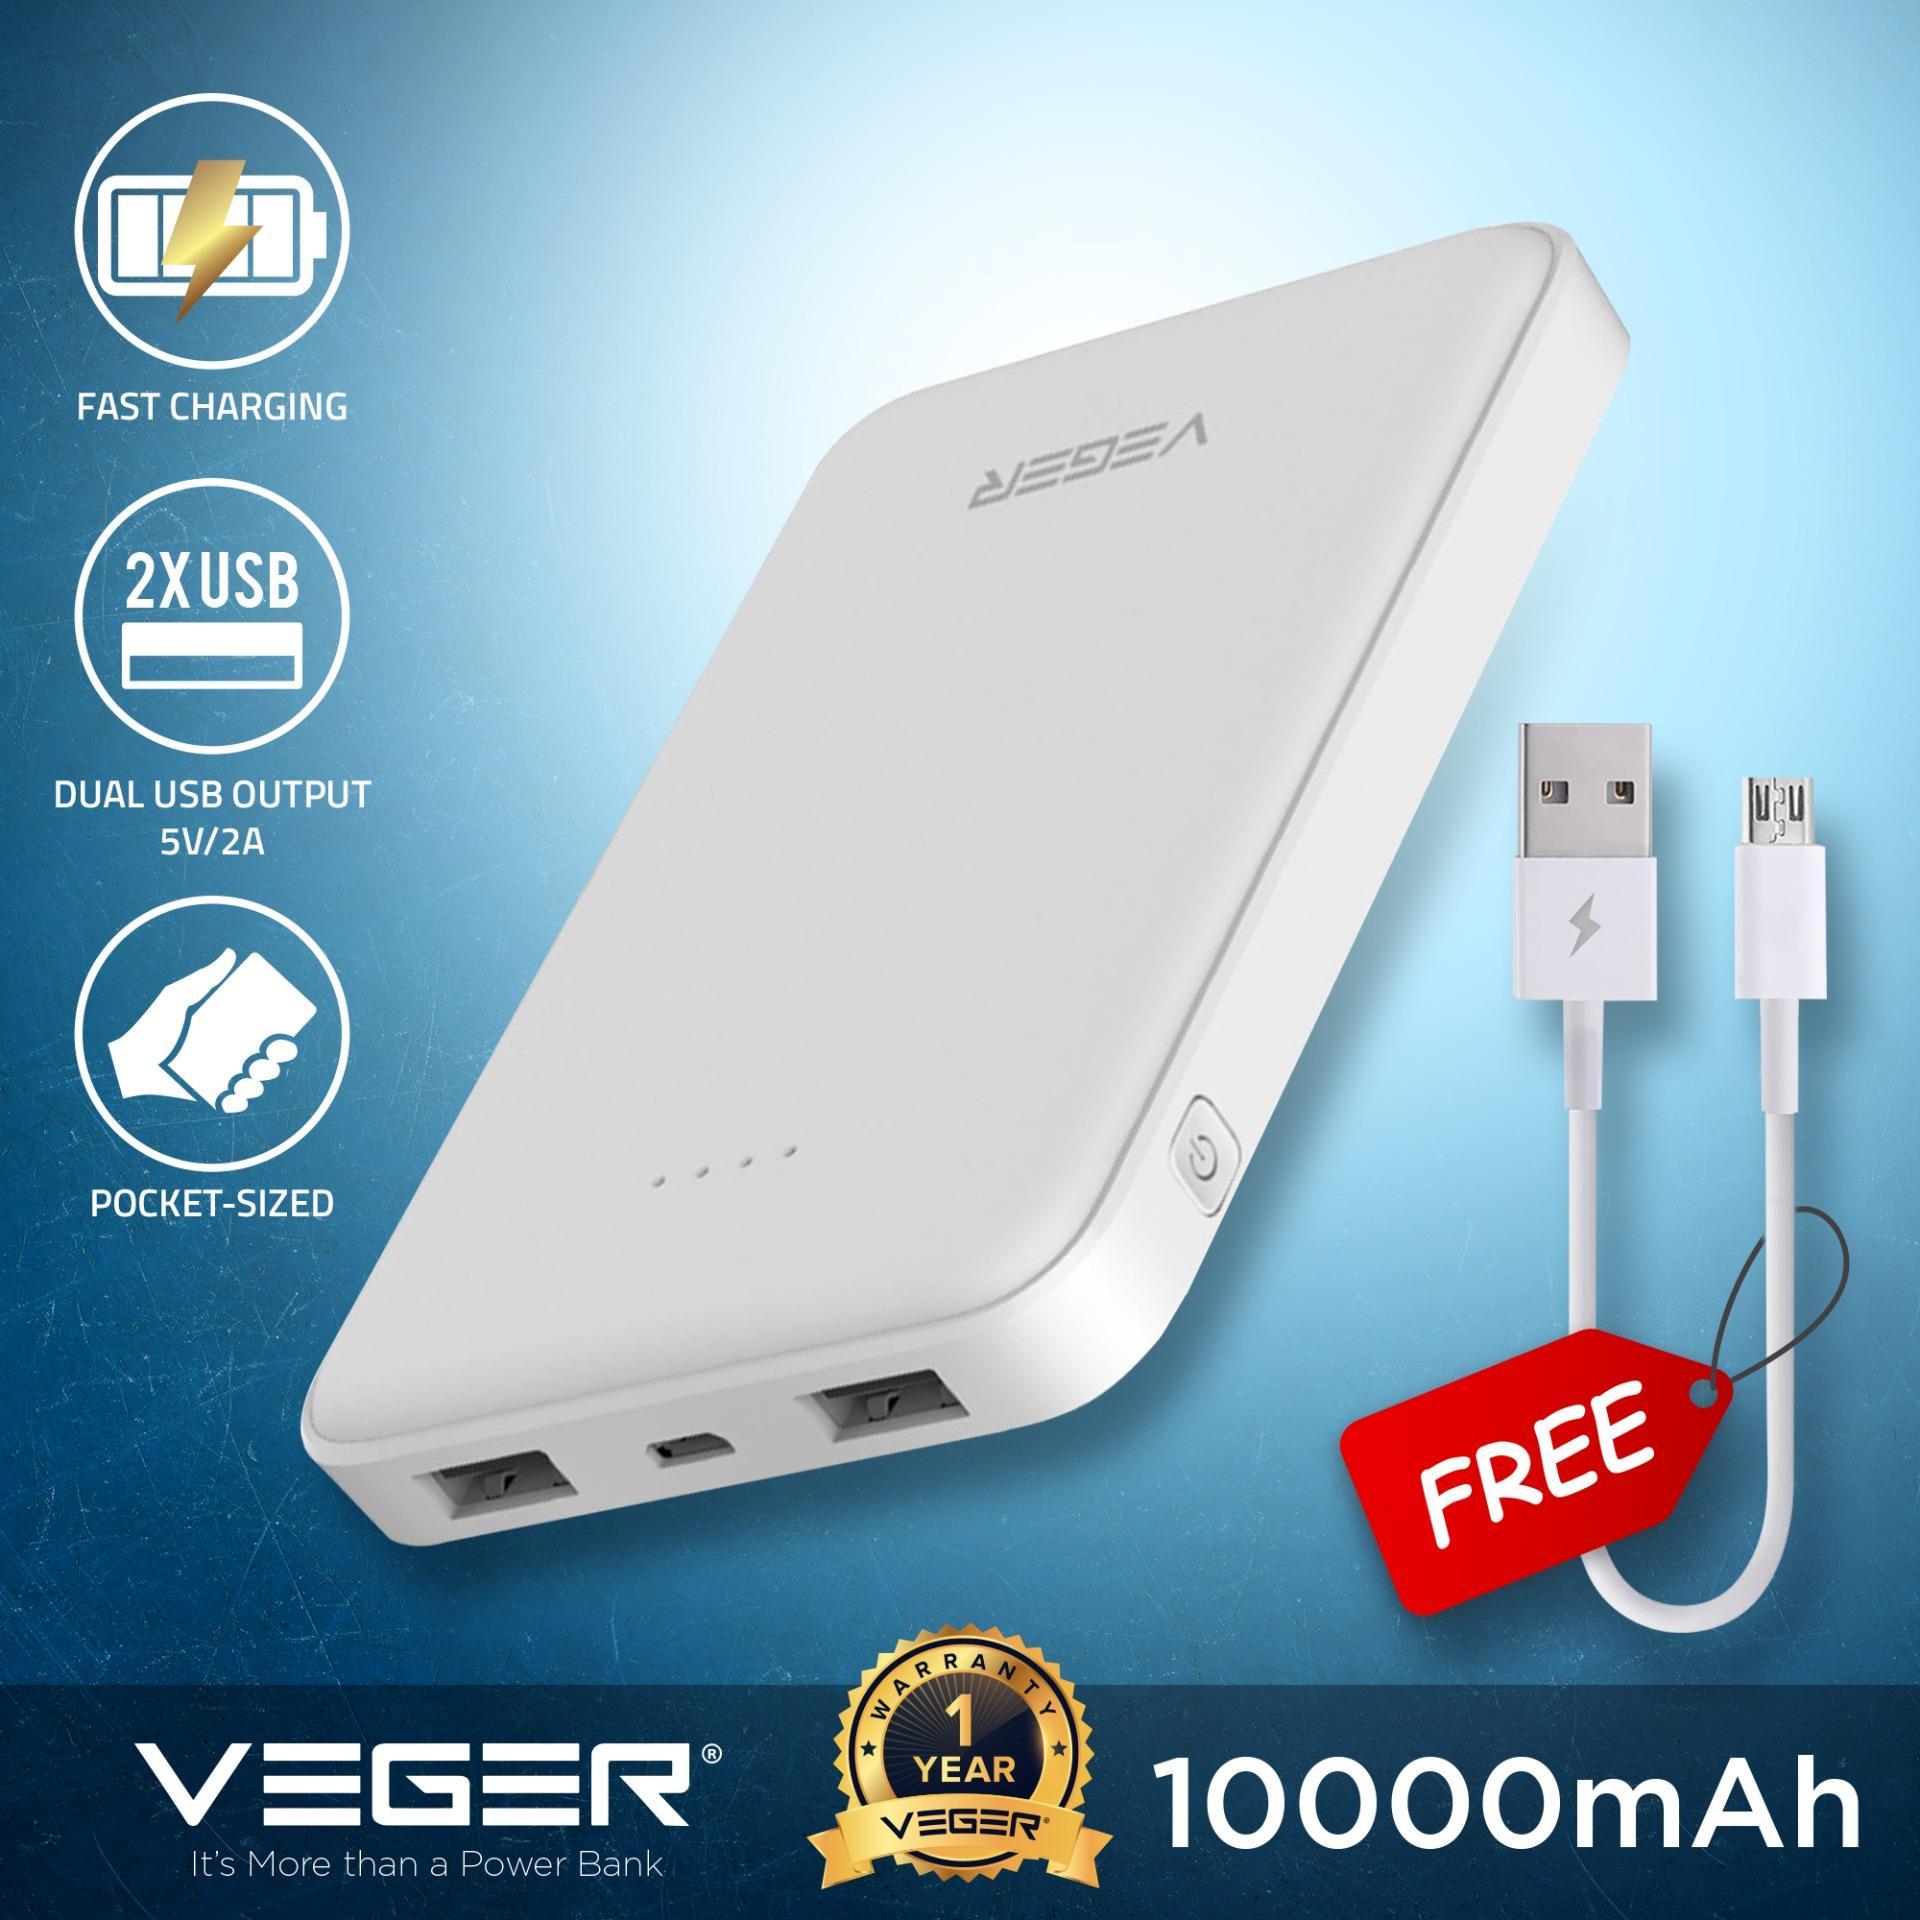 VEGER VP1018 10000mAh Power Bank Slim Pocket Style Mini Powerbank Micro USB 2.0A Input 2.0A Dual USB Output External Battery Compact Portable Charger.